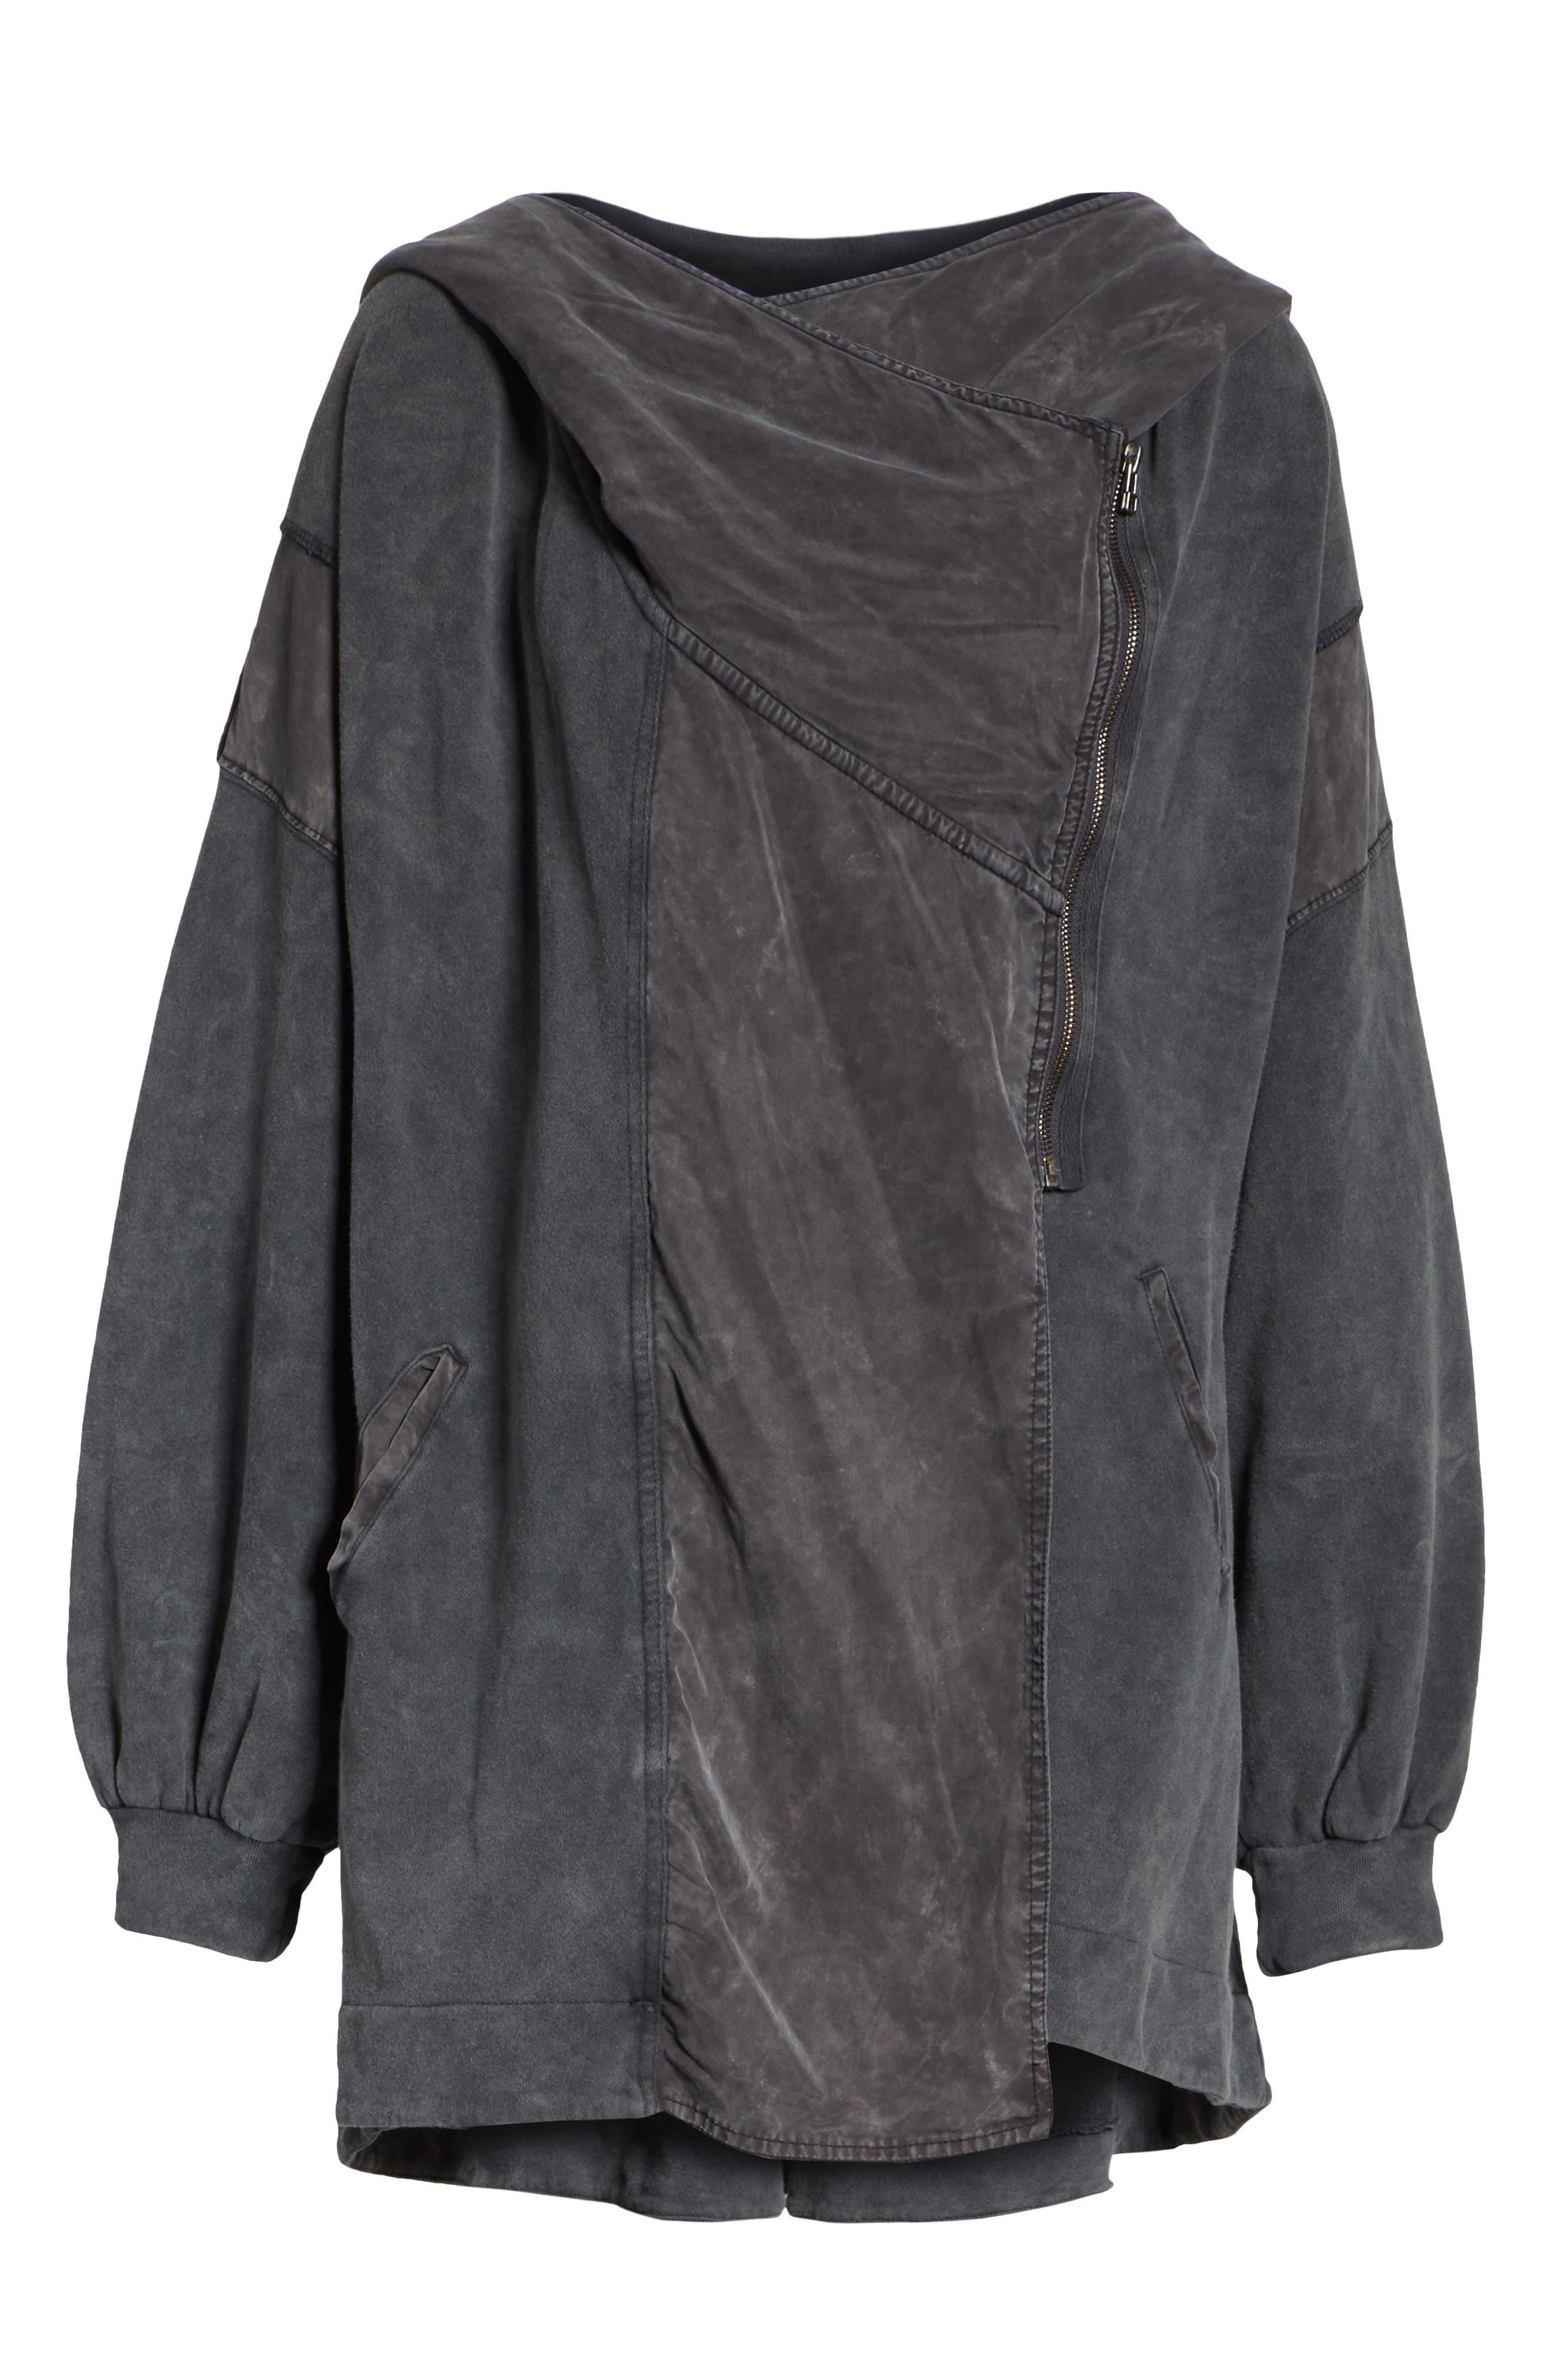 C'mon Hooded Cardigan,                             Alternate thumbnail 6, color,                             Black